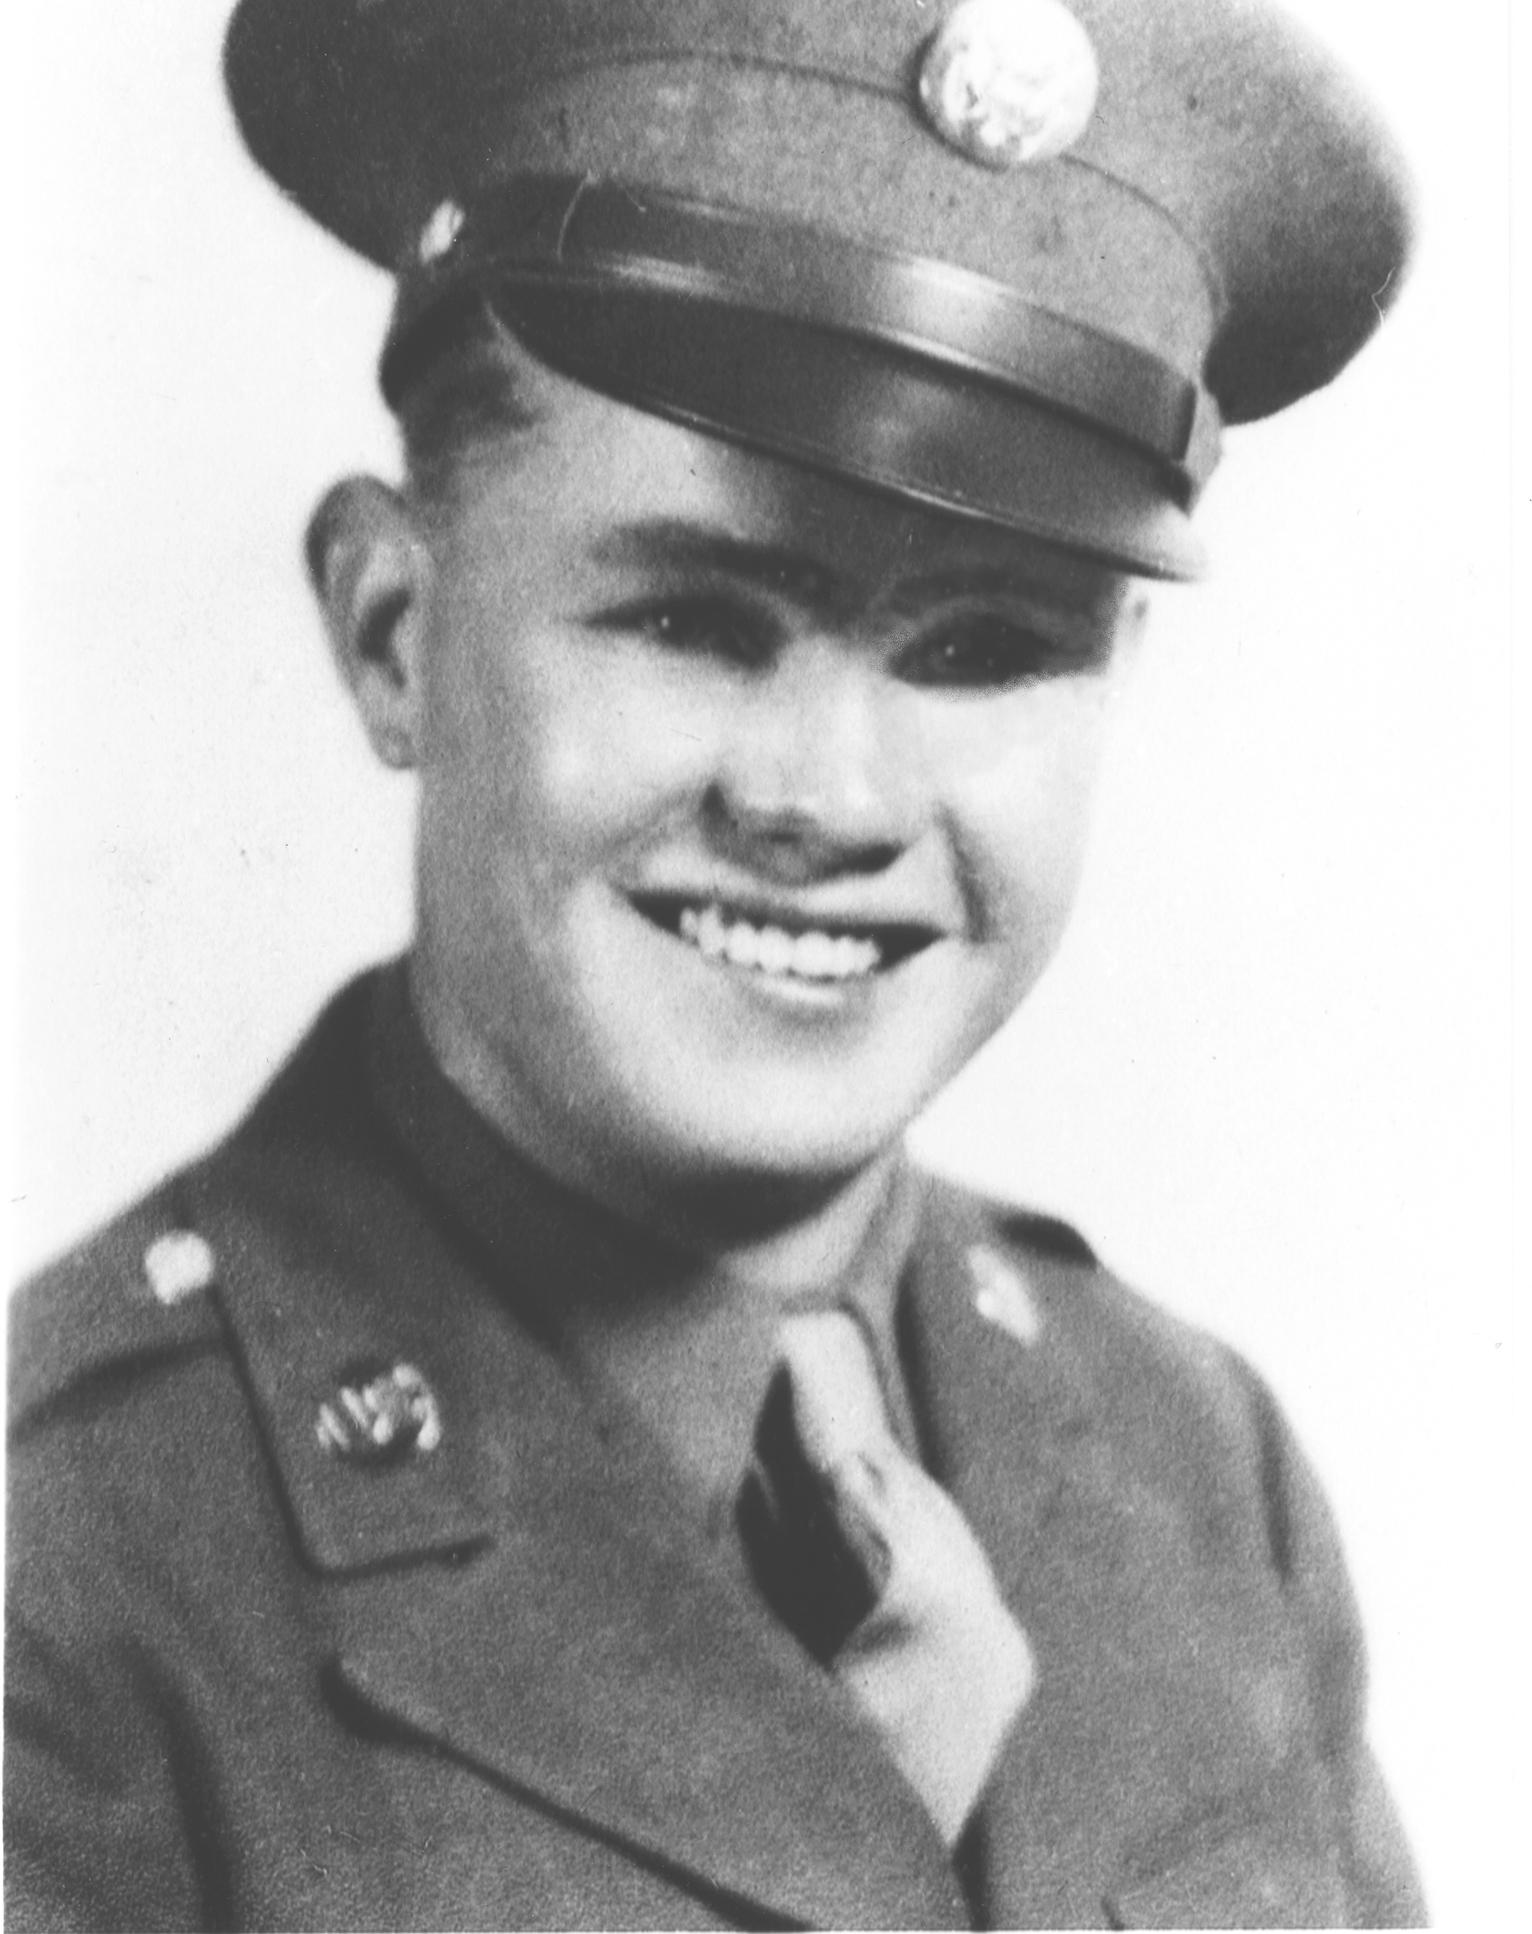 Donald Ward Petersen